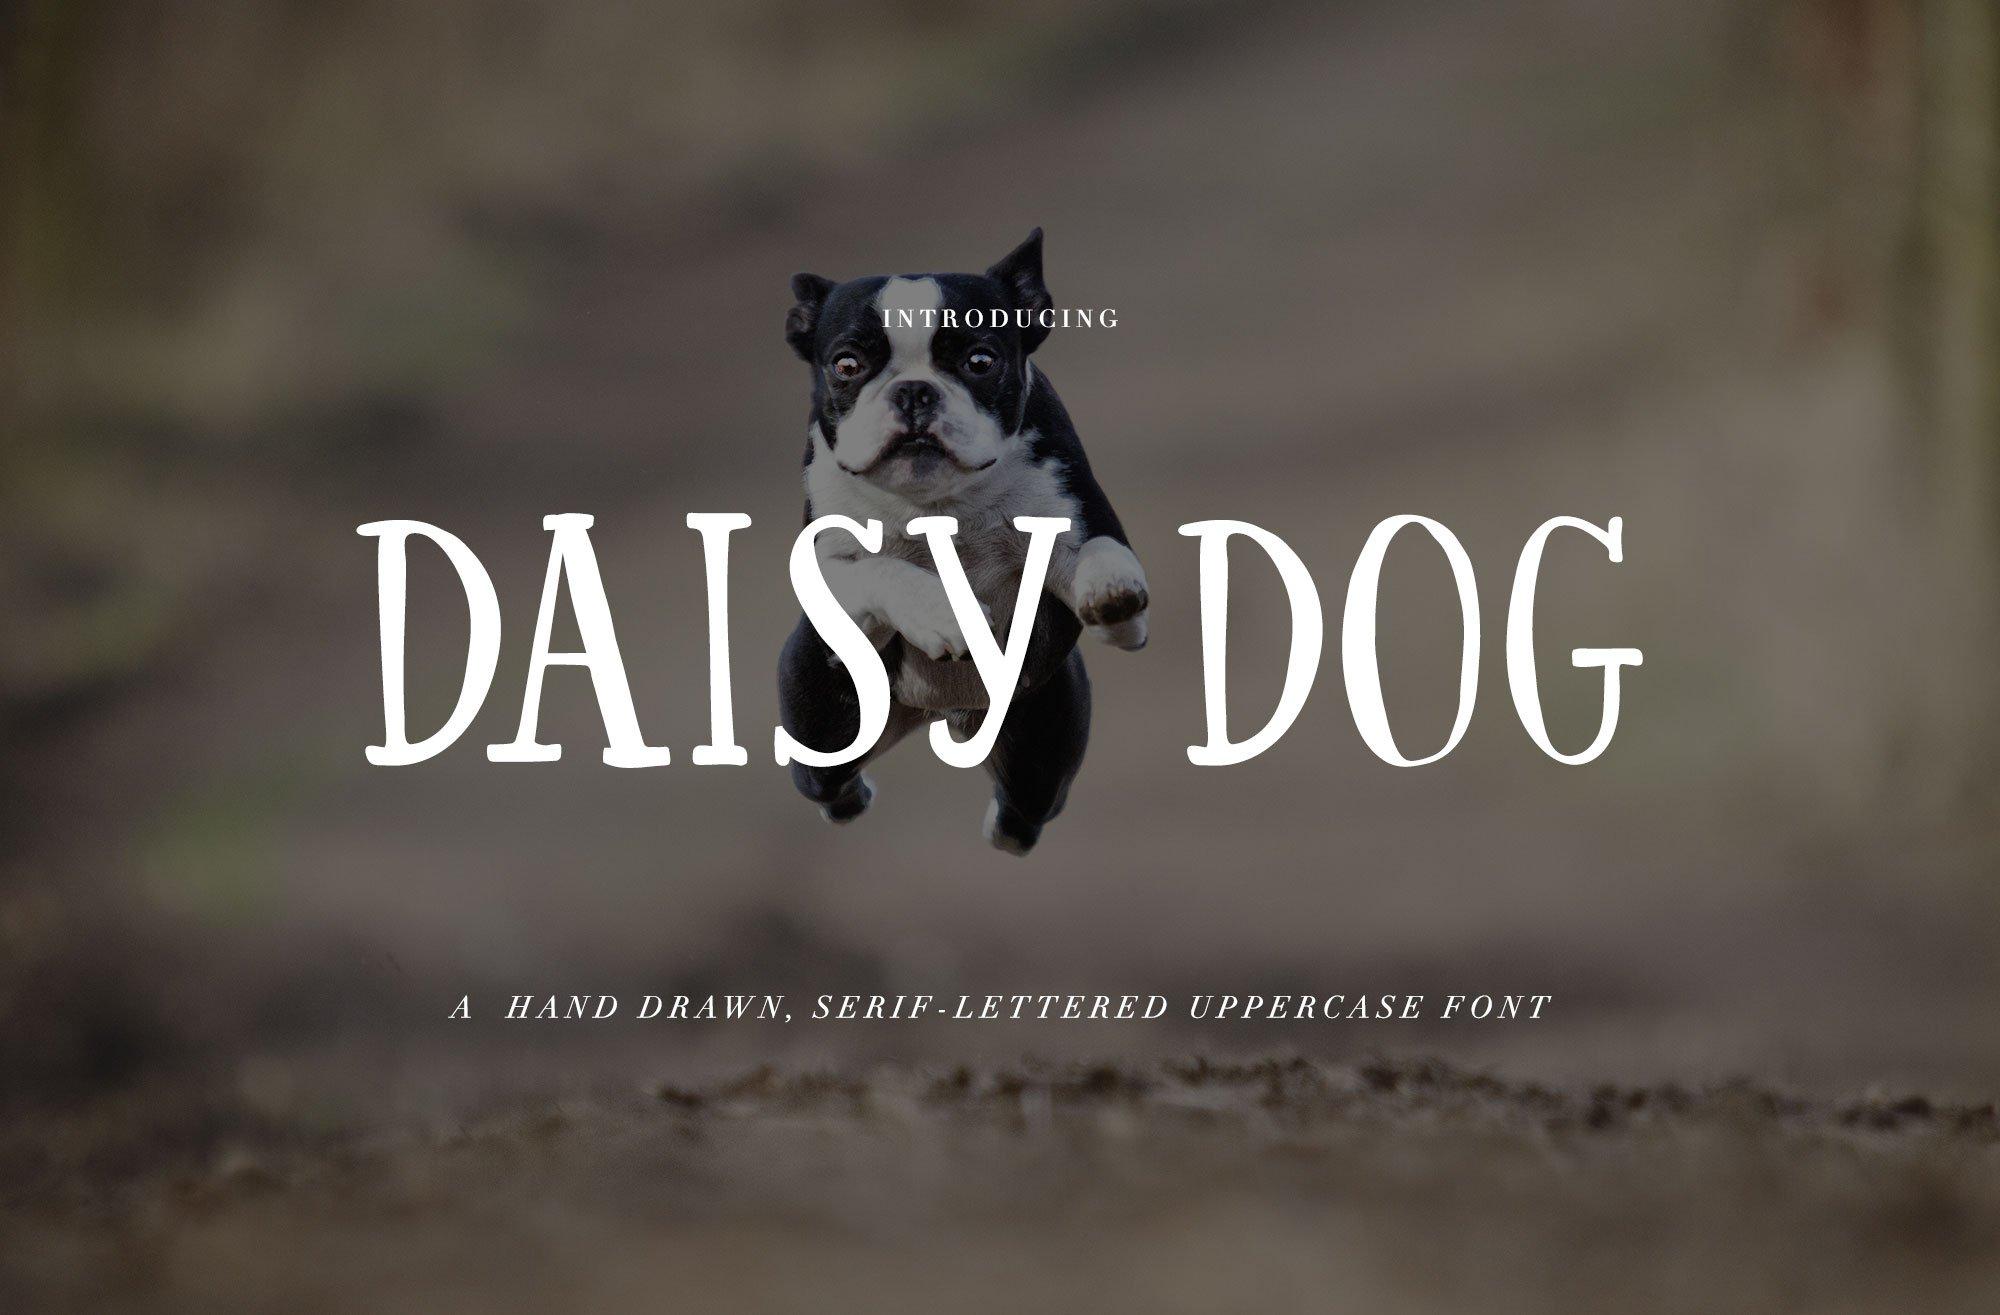 Hand Written Font Daisy Dog Serif Fonts Creative Market Wet Folding Little Terrier Paper Unlimited